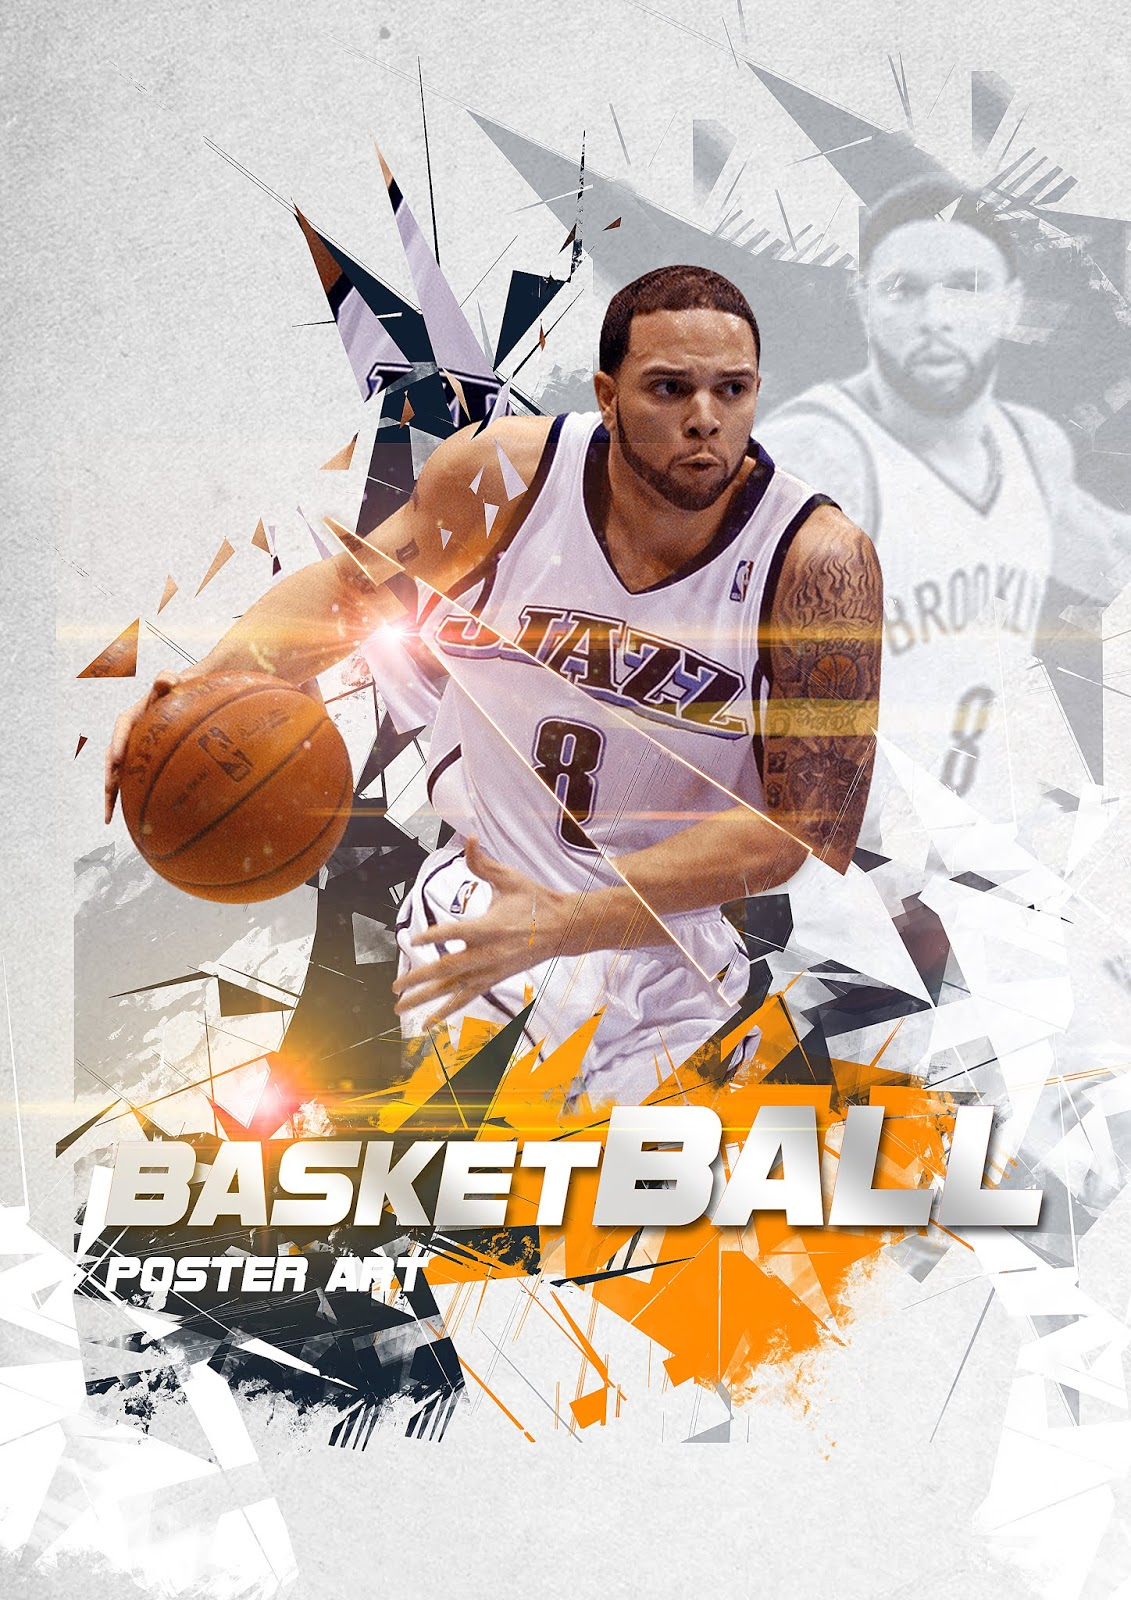 photoshop tutorial sports poster design ideosprocess